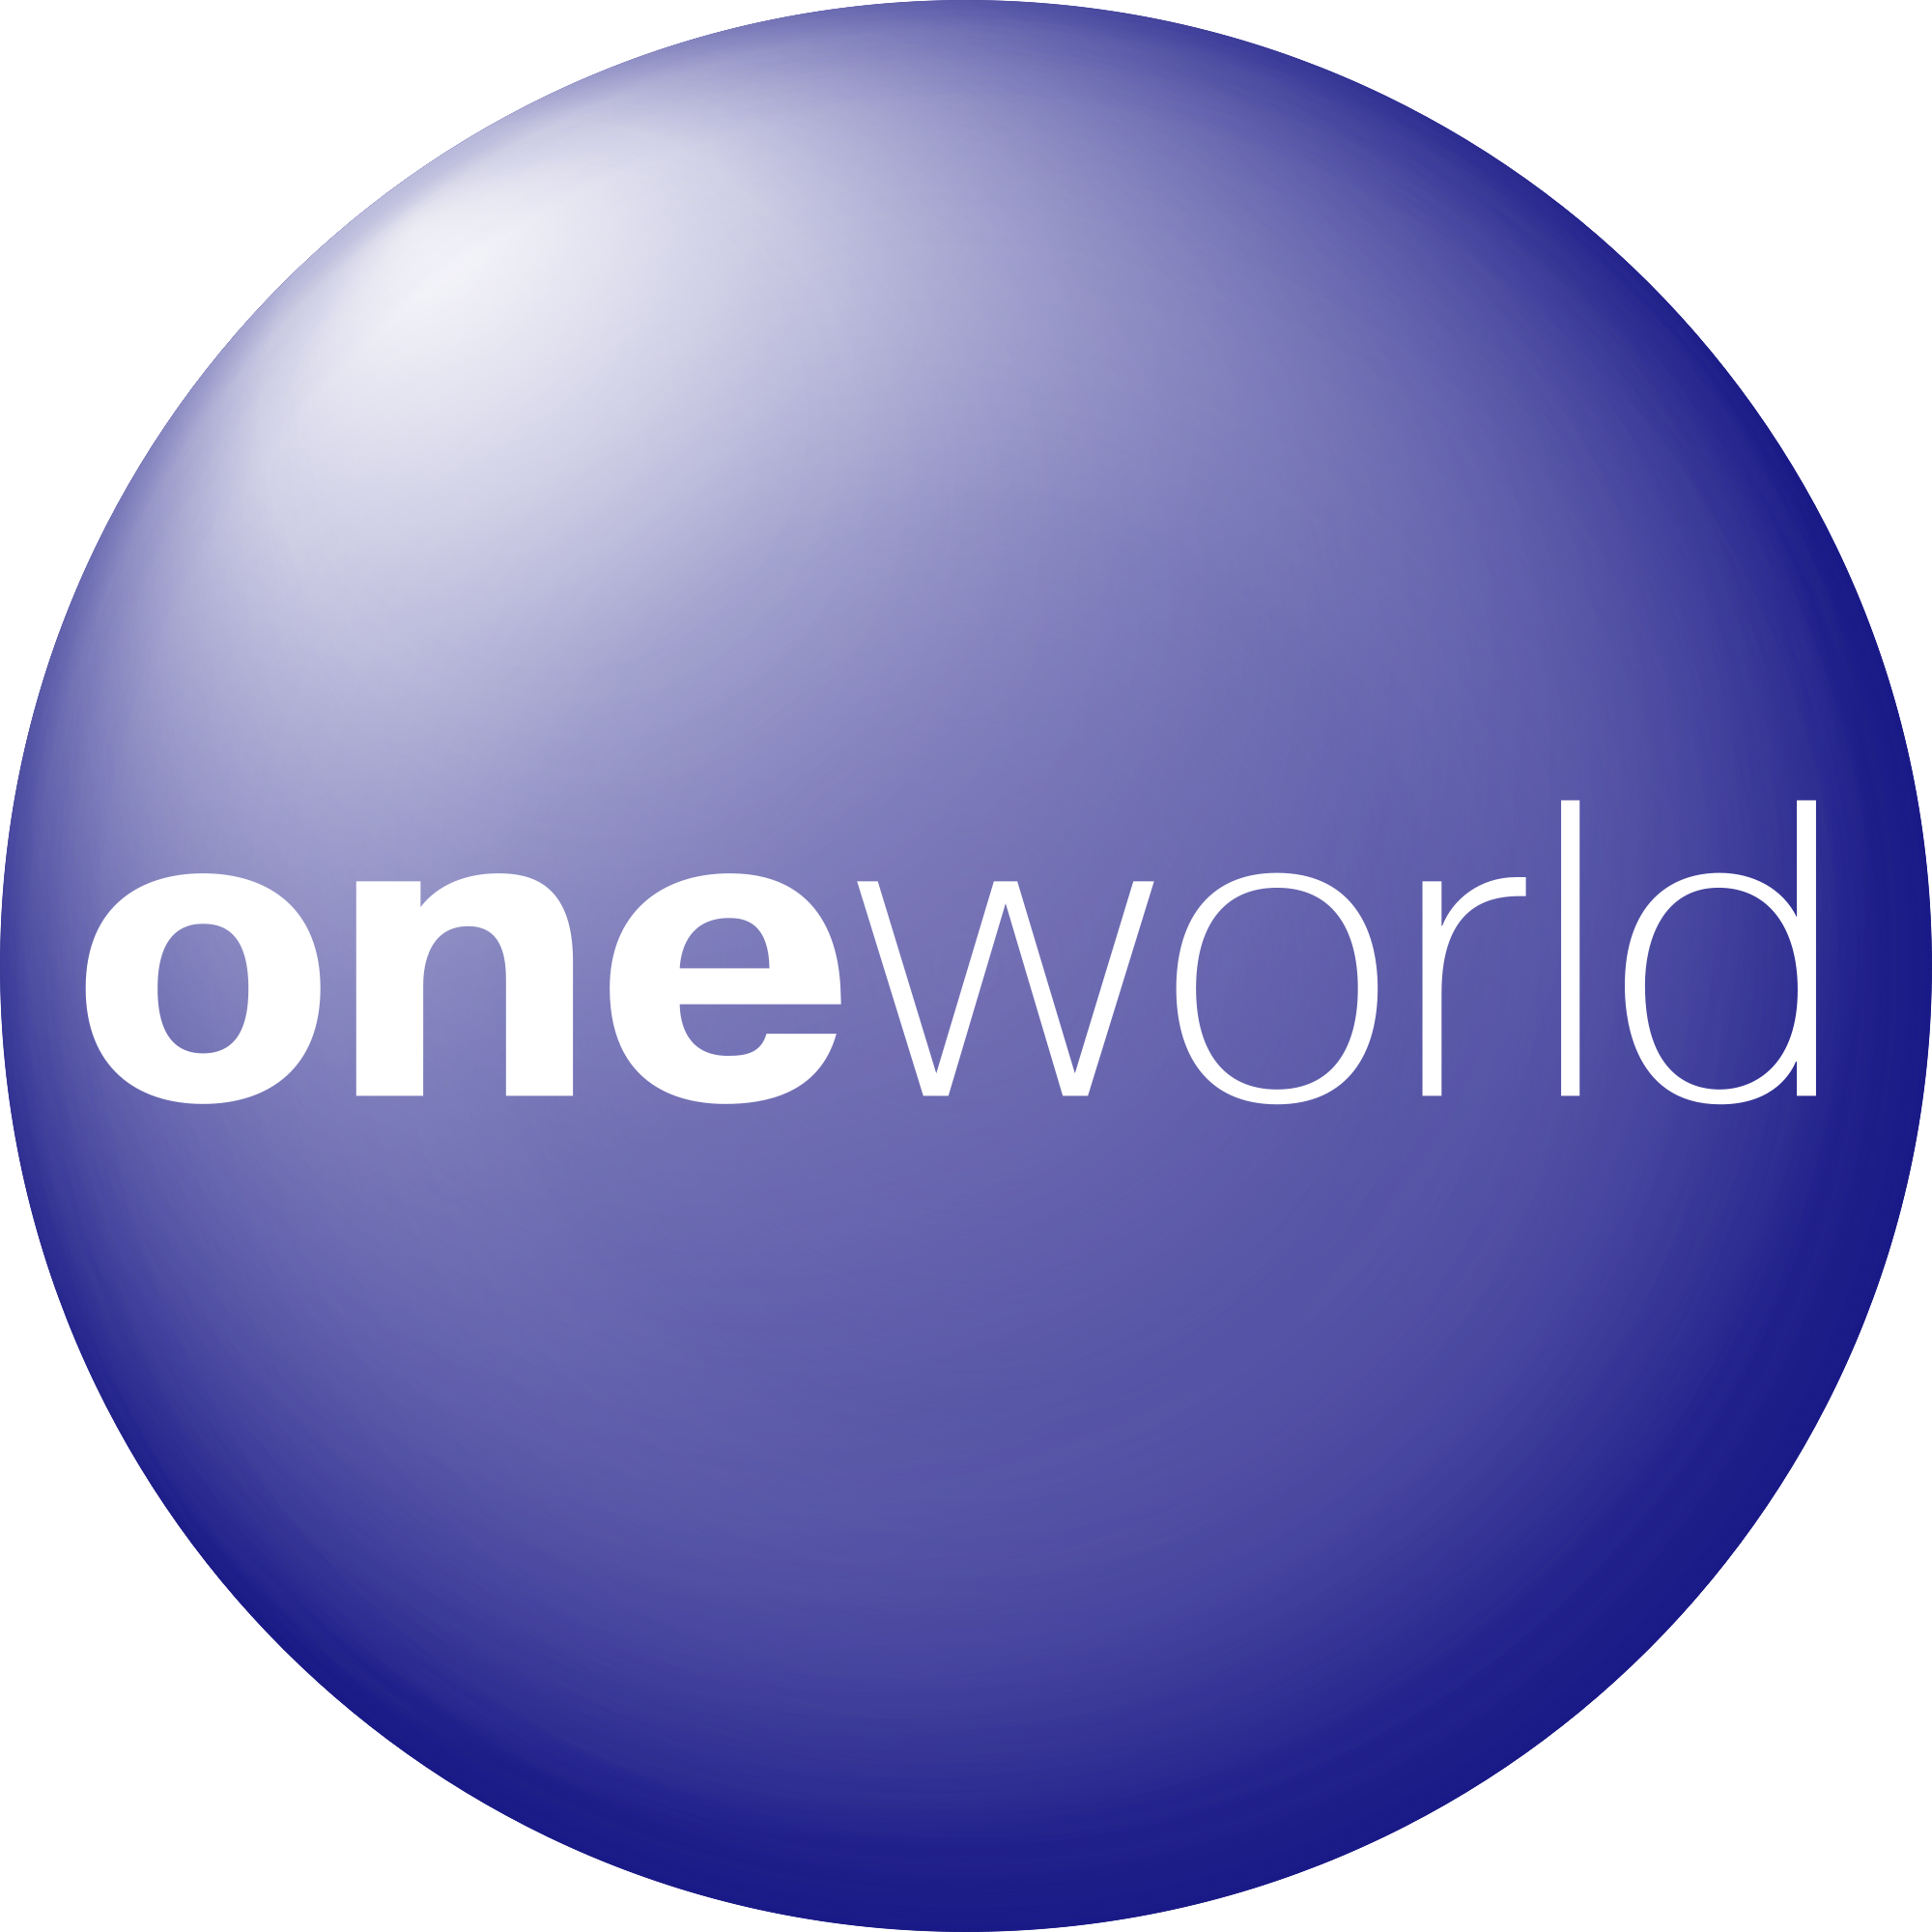 oneworld.png